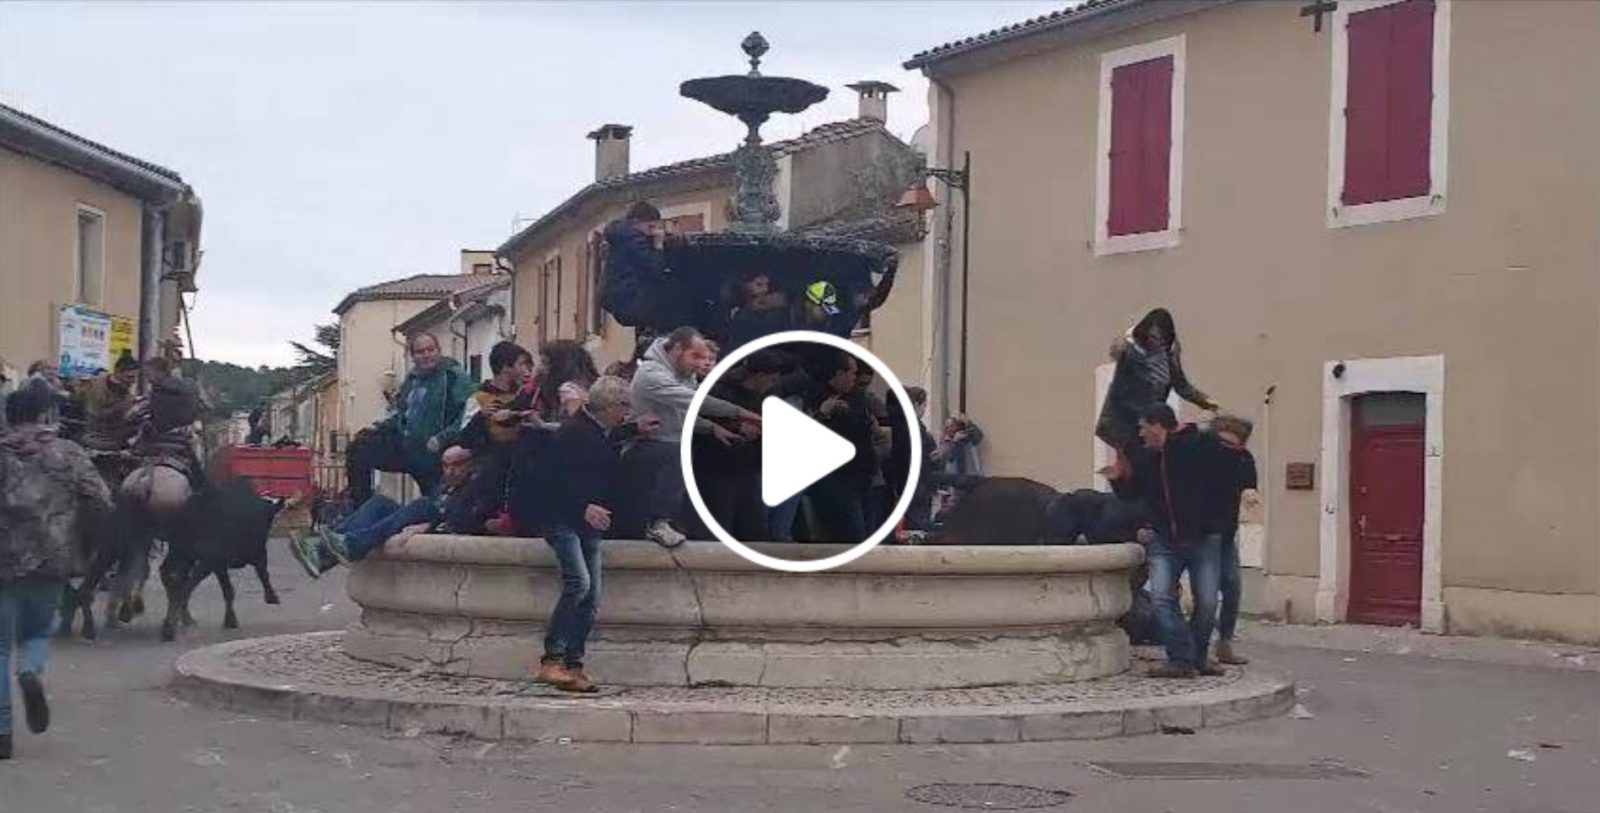 CAVEIRAC (10/03/2019) – Retour en vidéo sur la bandido